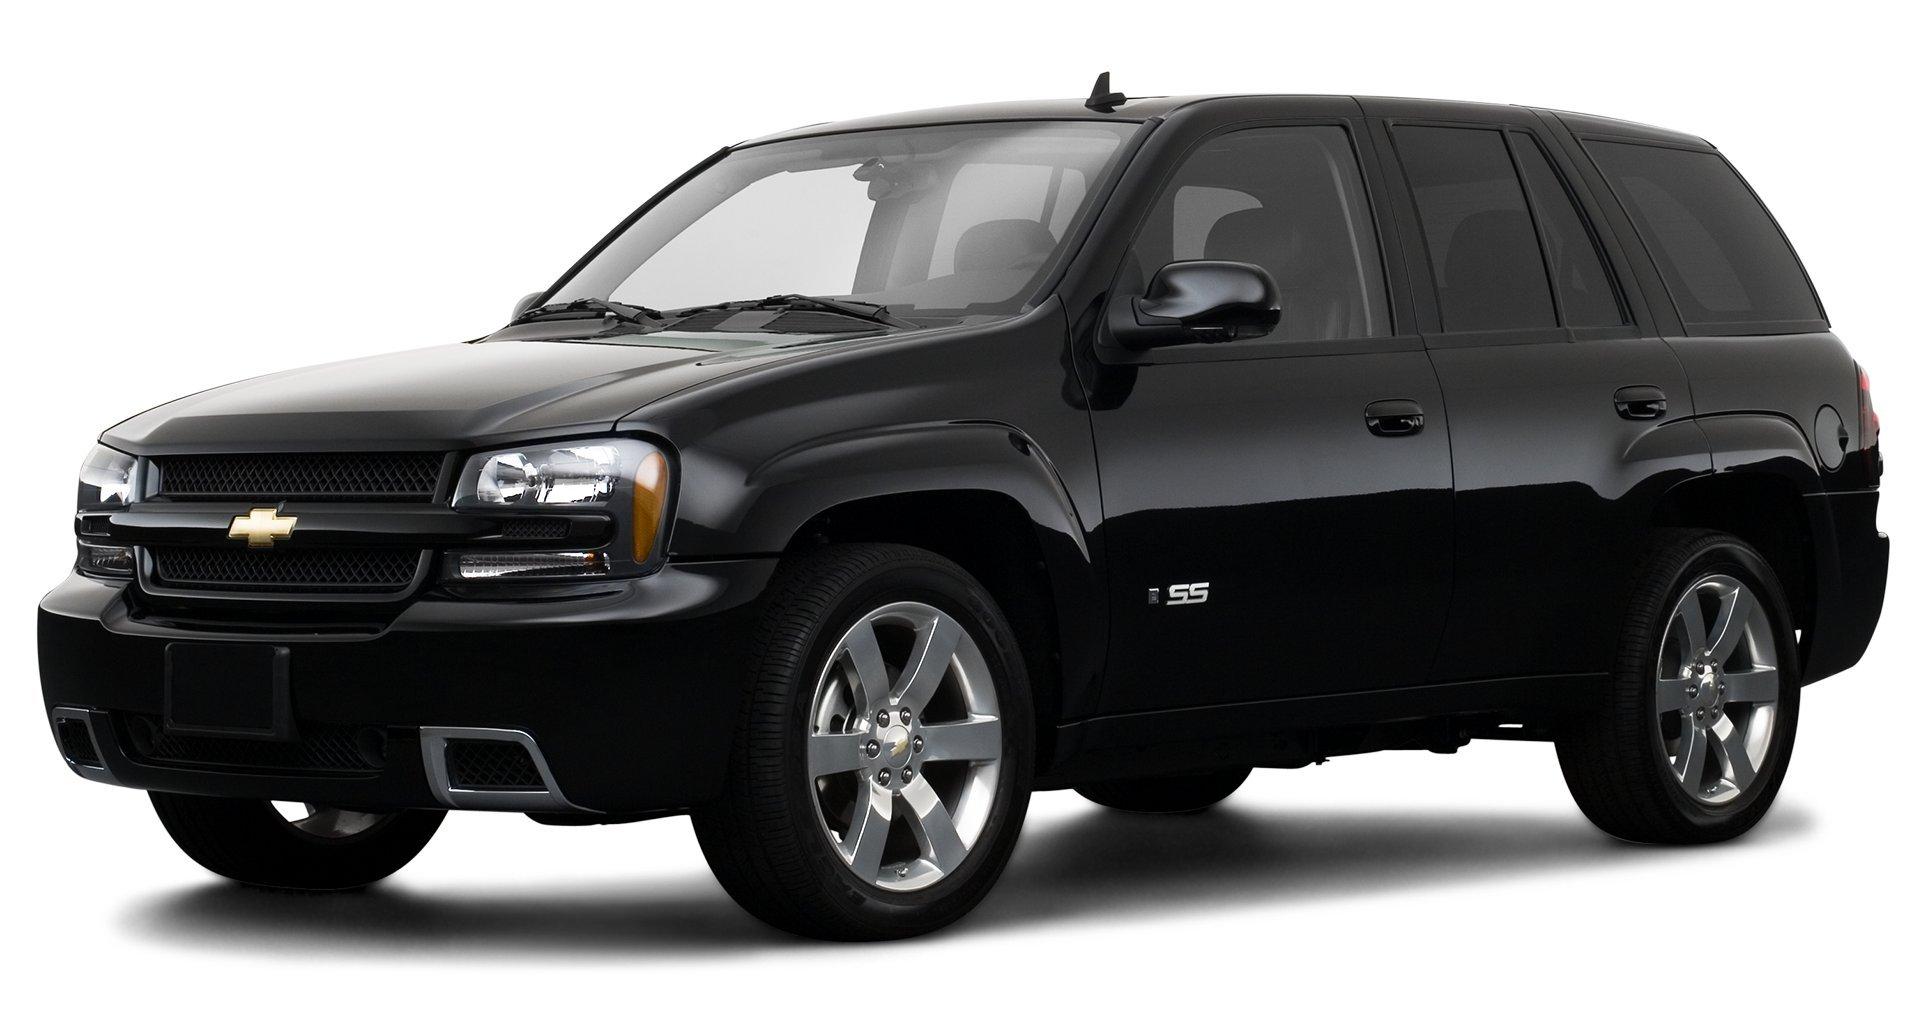 Amazon 2009 Chevrolet Trailblazer Reviews and Specs